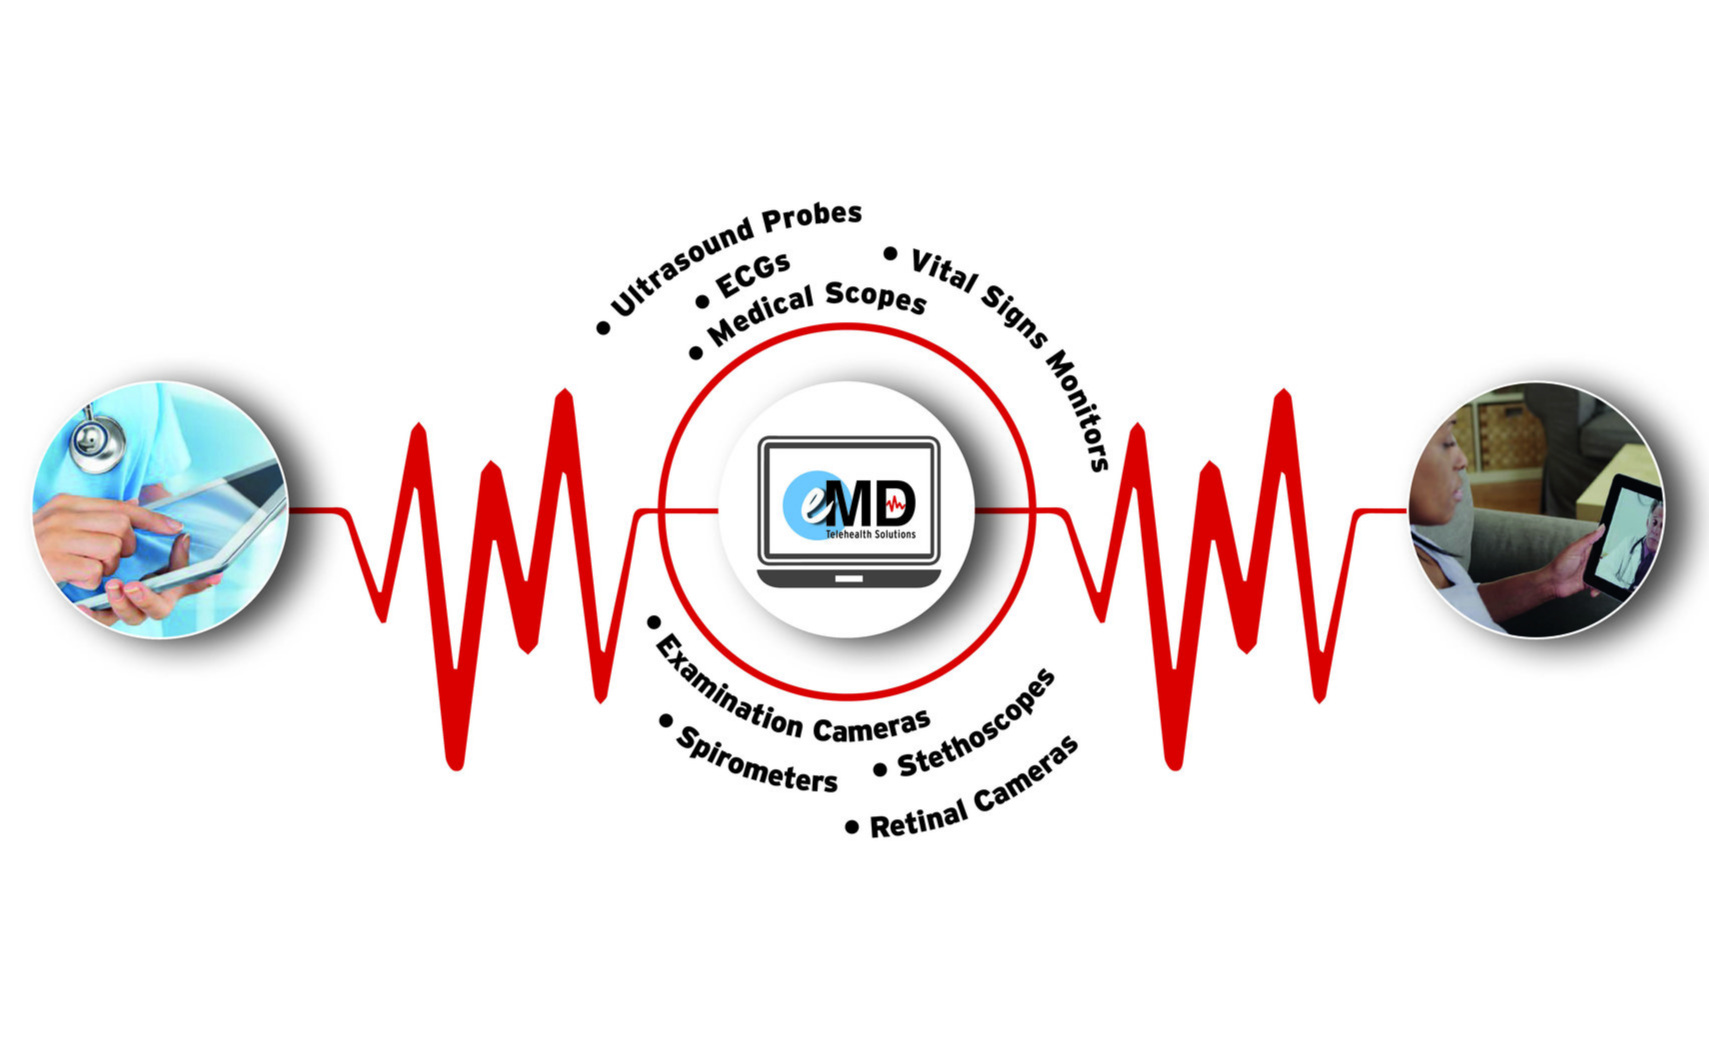 eMD_diagram1006.jpg